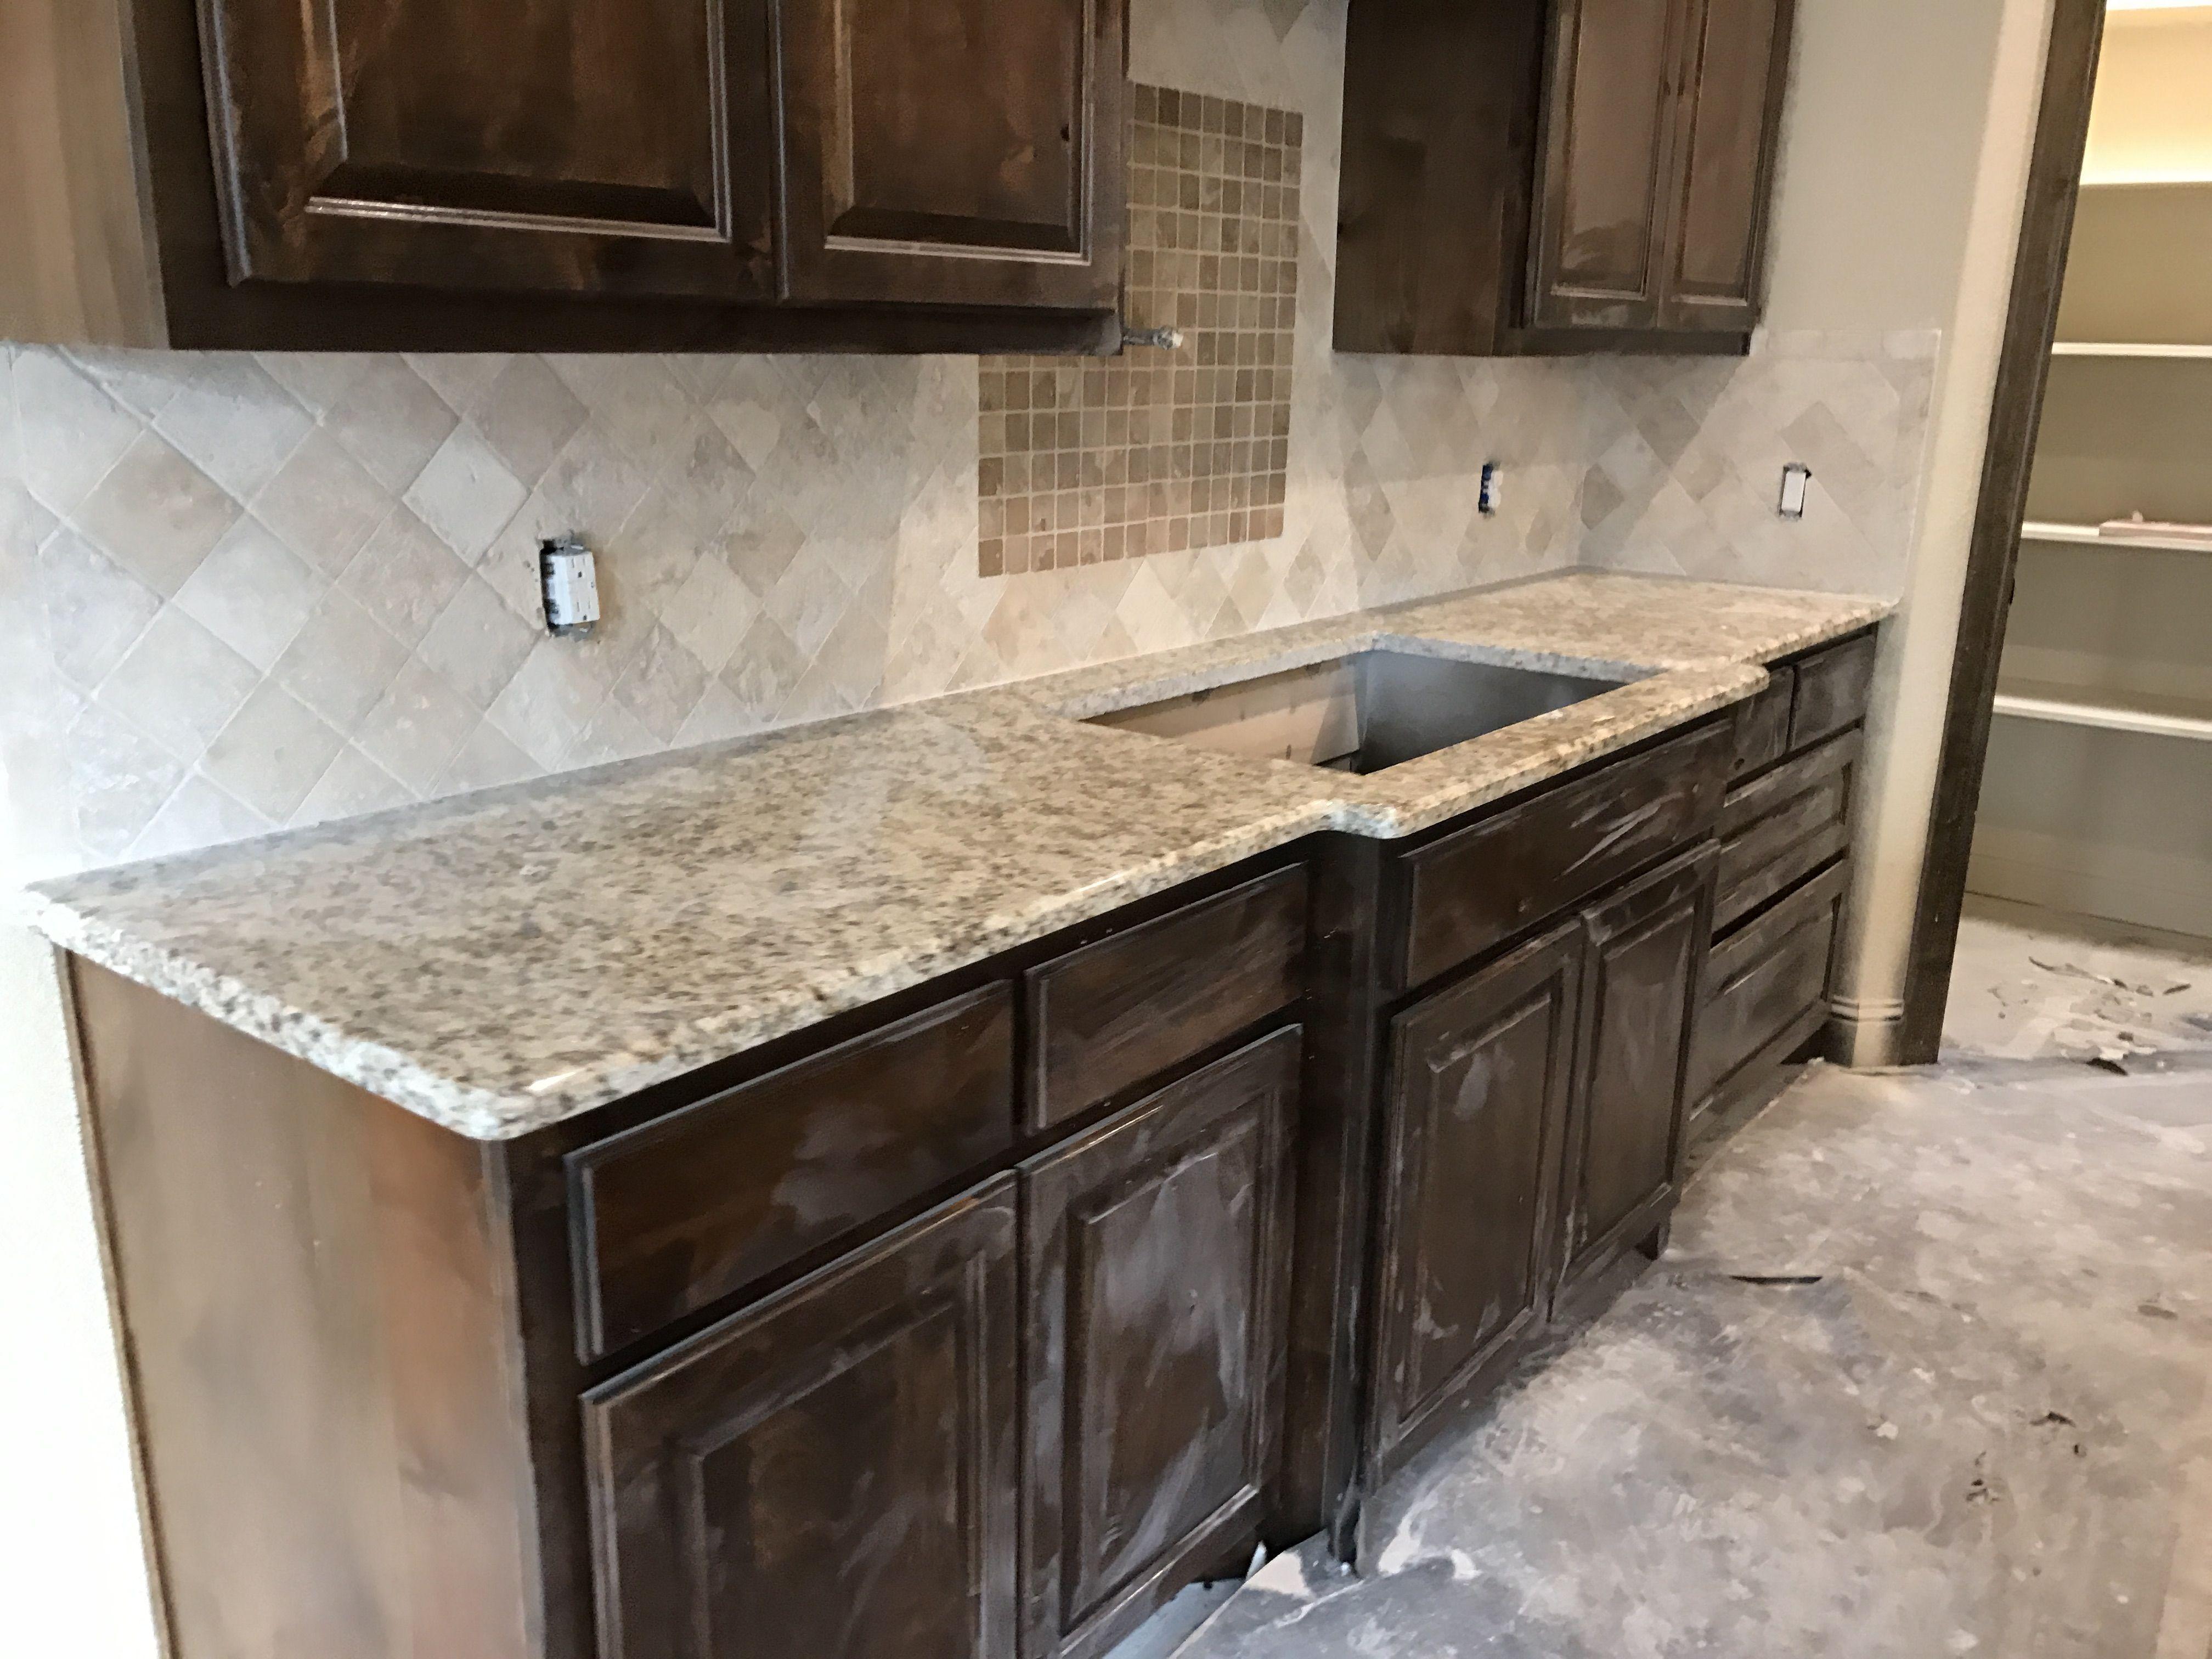 Kitchen Countertops In Giallo Napoli In The Works Kitchen Remodel Kitchen Backsplash Granite Countertops